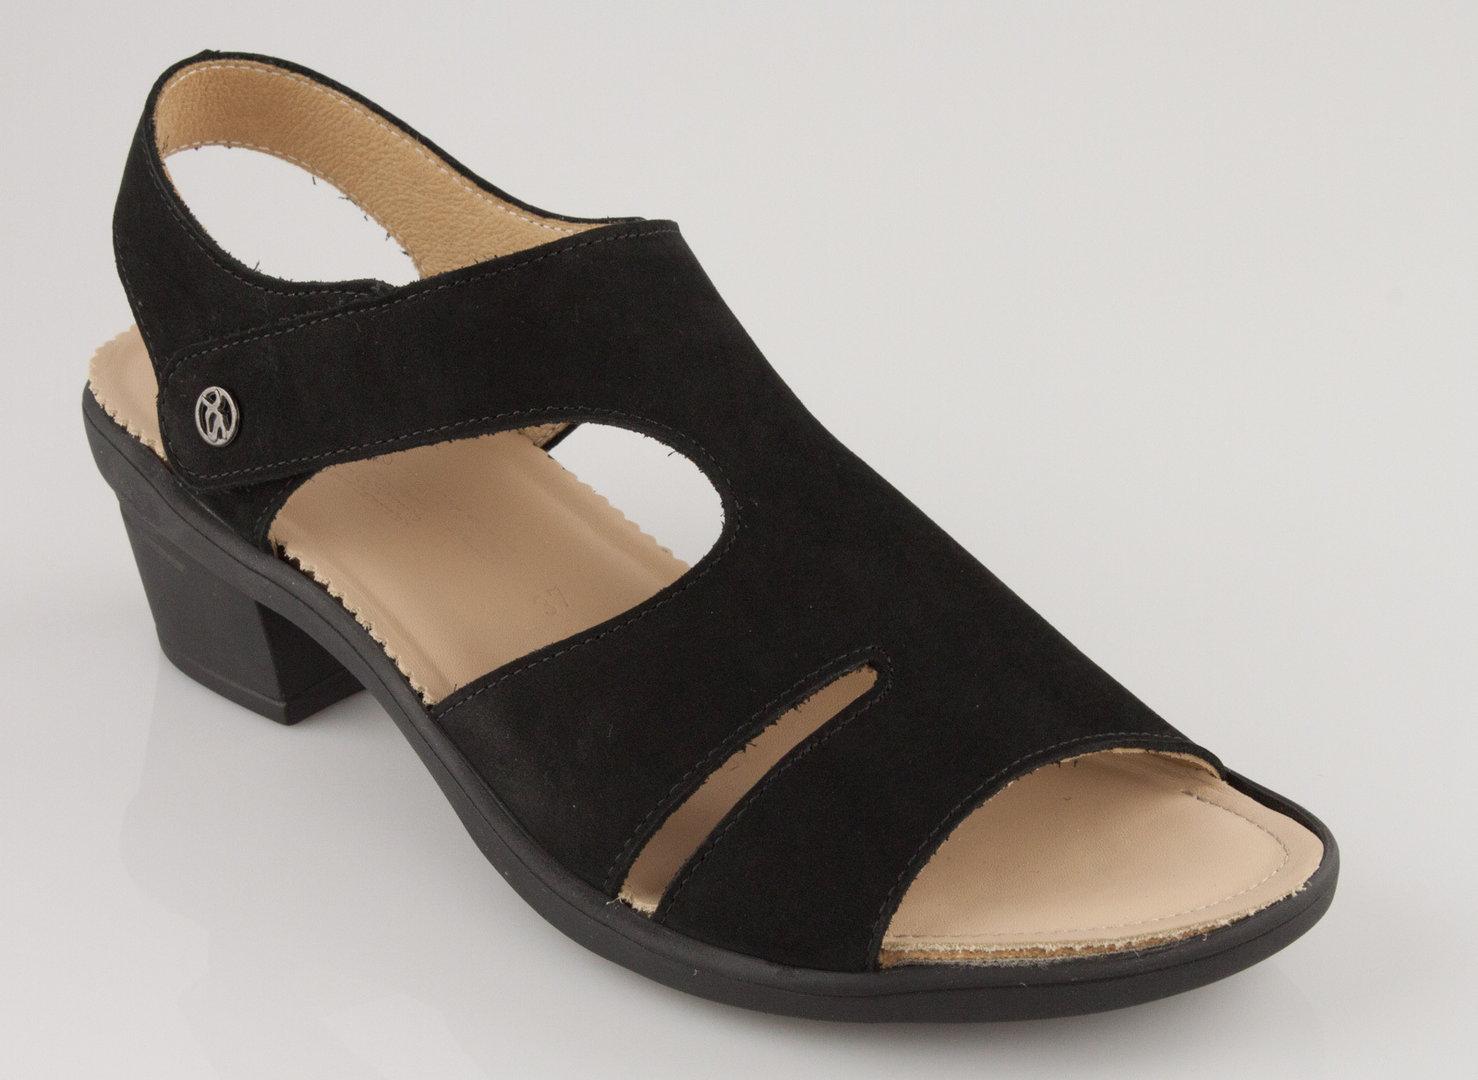 Black 1 Dressy Xs Hartjes 16032 Sandals nP0wOk8